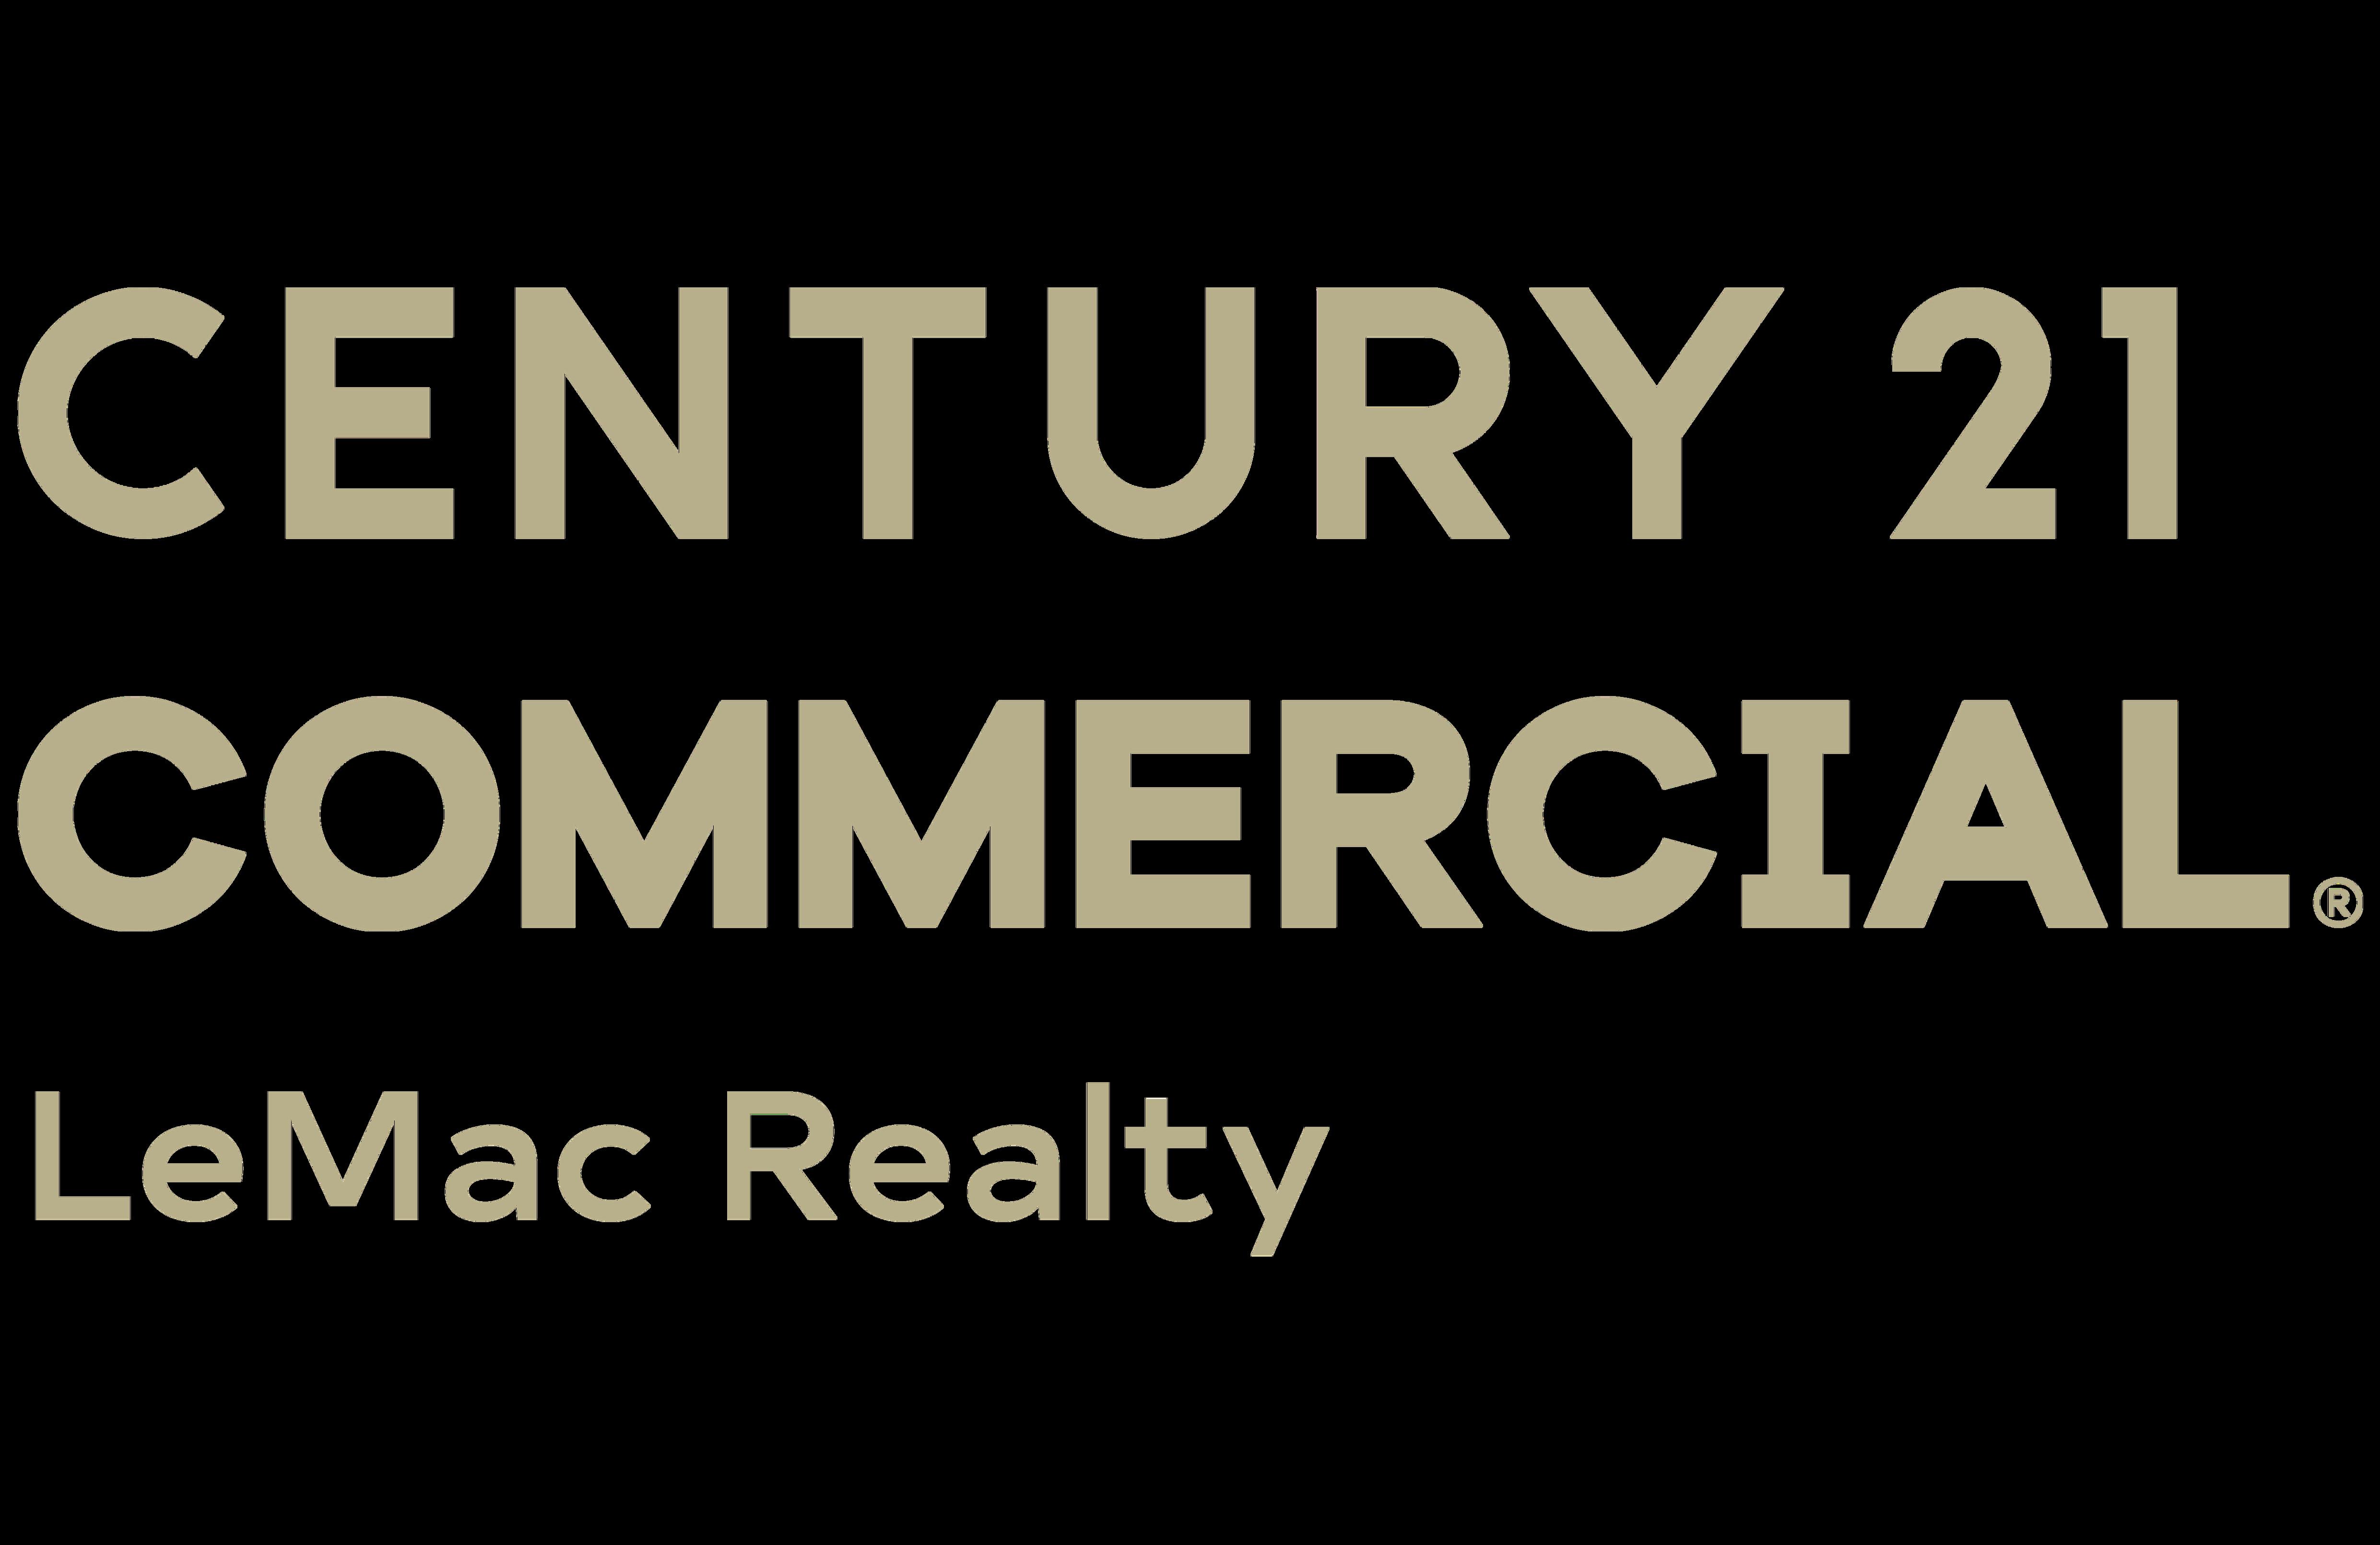 CENTURY 21 LeMac Realty